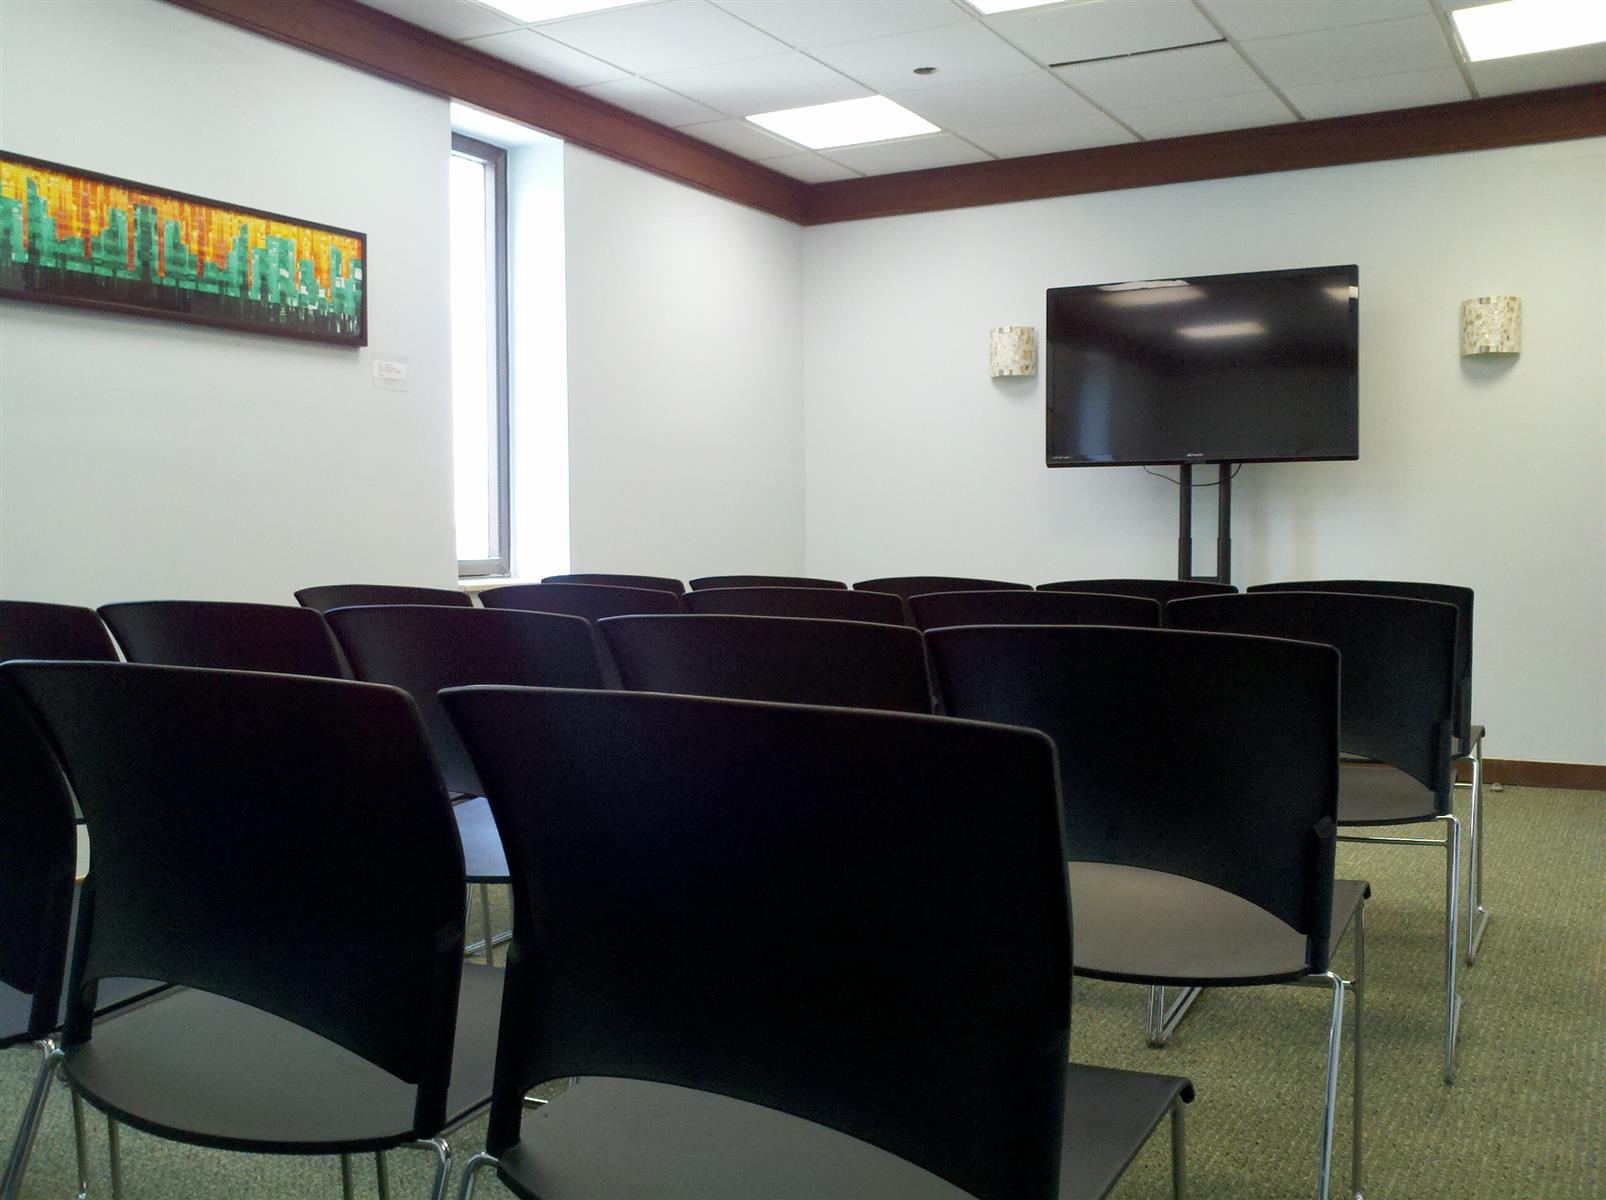 mindwarehouse - Presentation Room